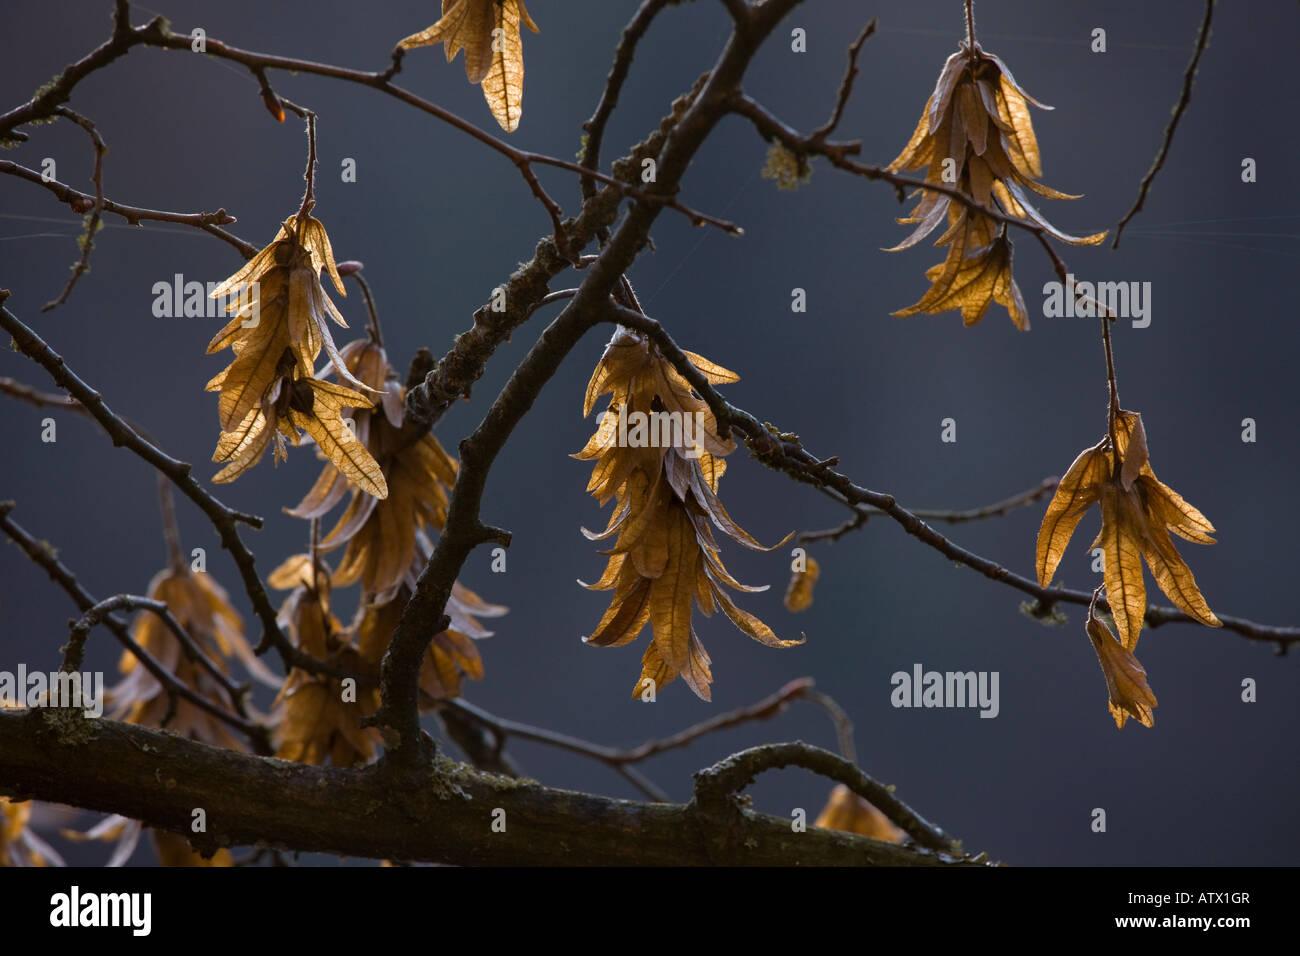 Fruits of hornbeam Carpinus betulus in winter - Stock Image